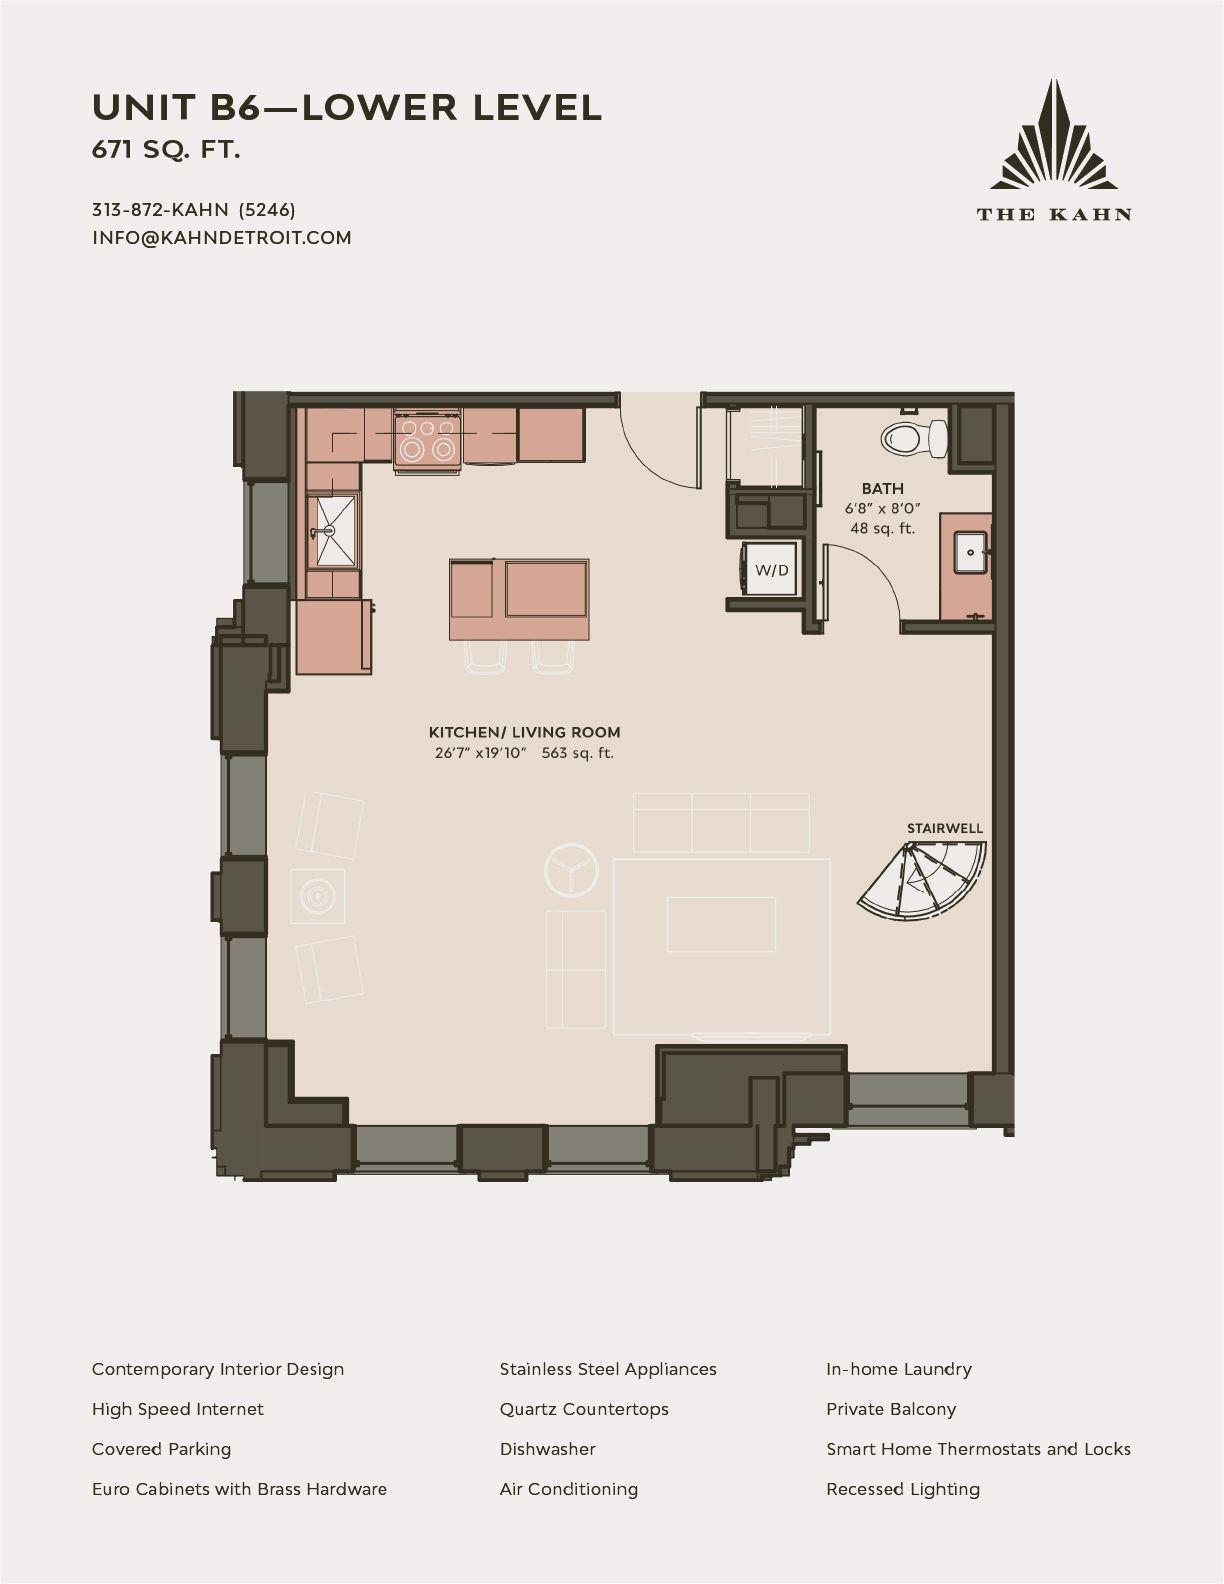 B6 Lower level floor plan